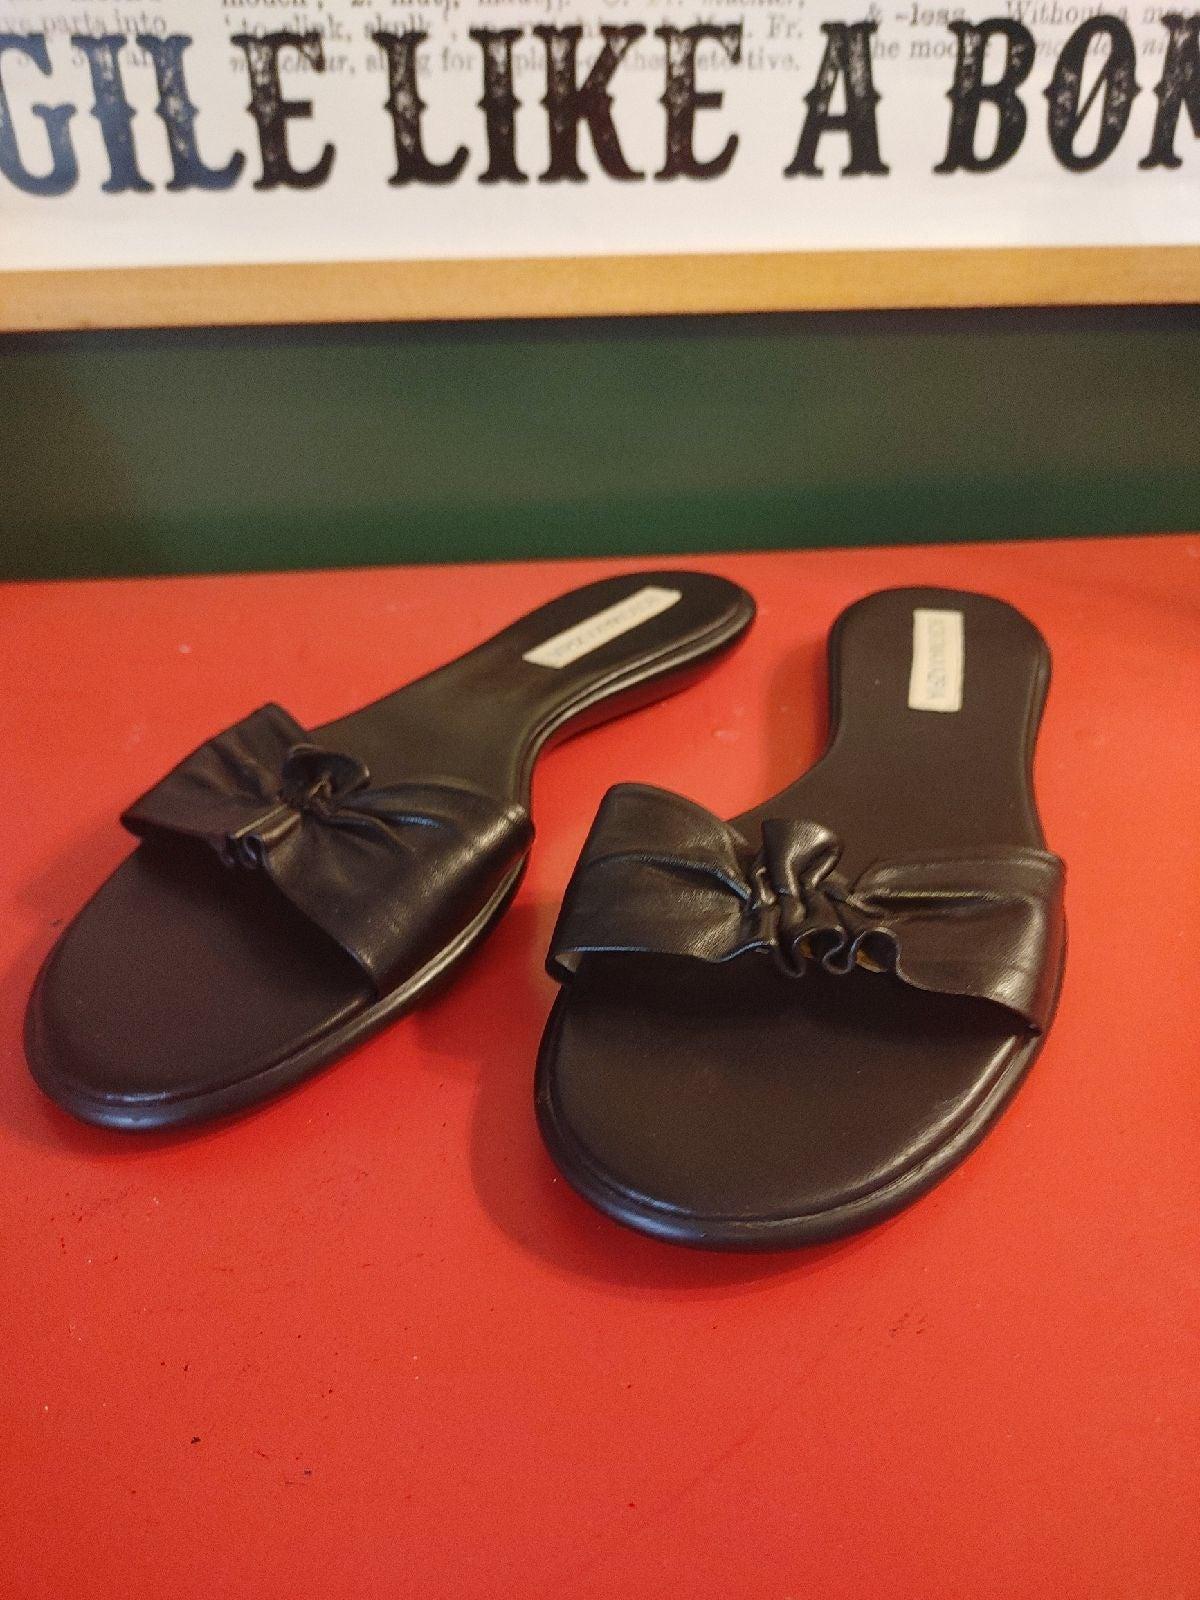 BCBG slide sandals